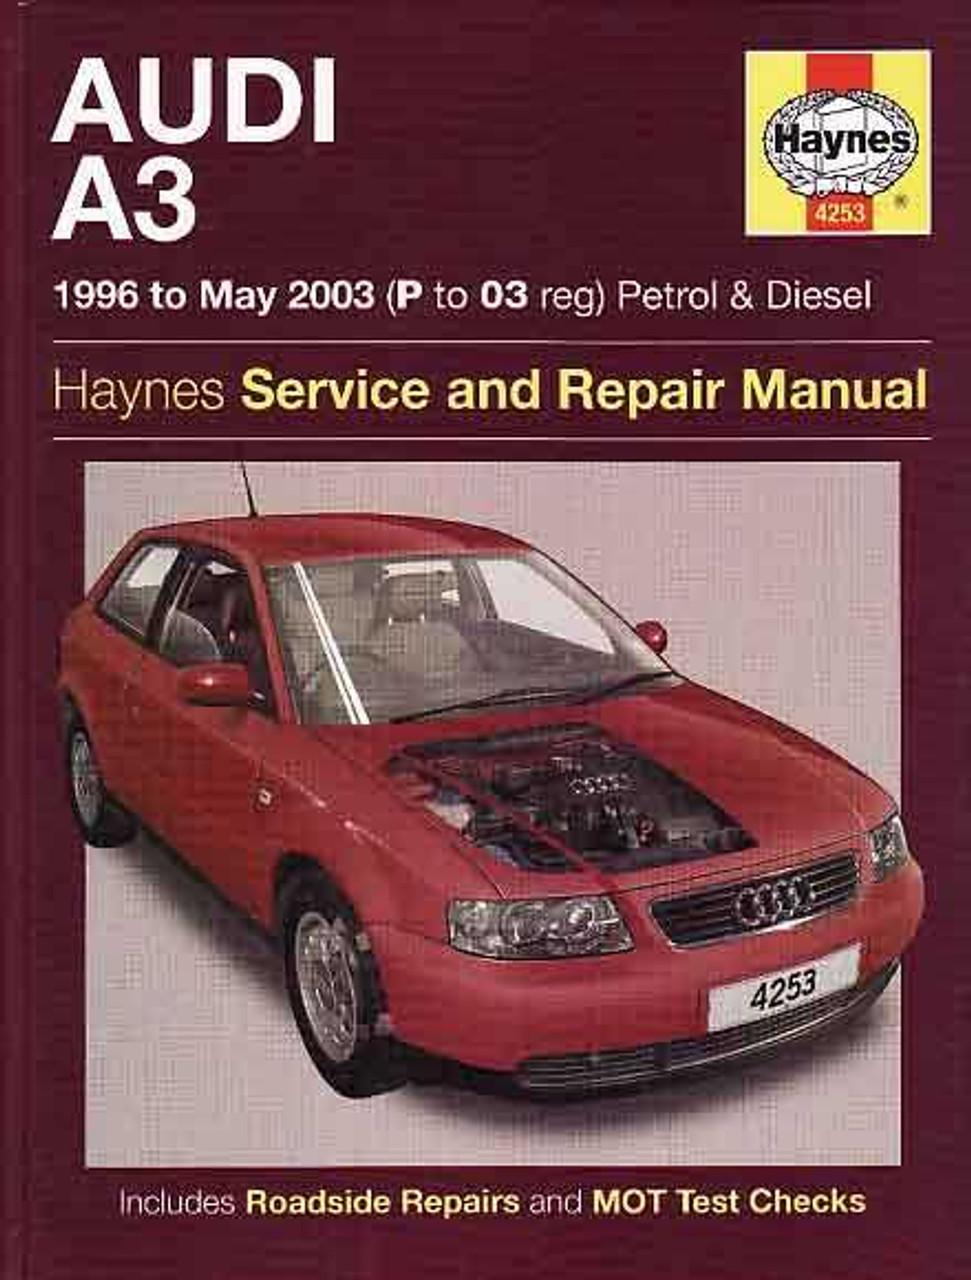 audi a3 1996 to 2003 petrol and diesel workshop manual